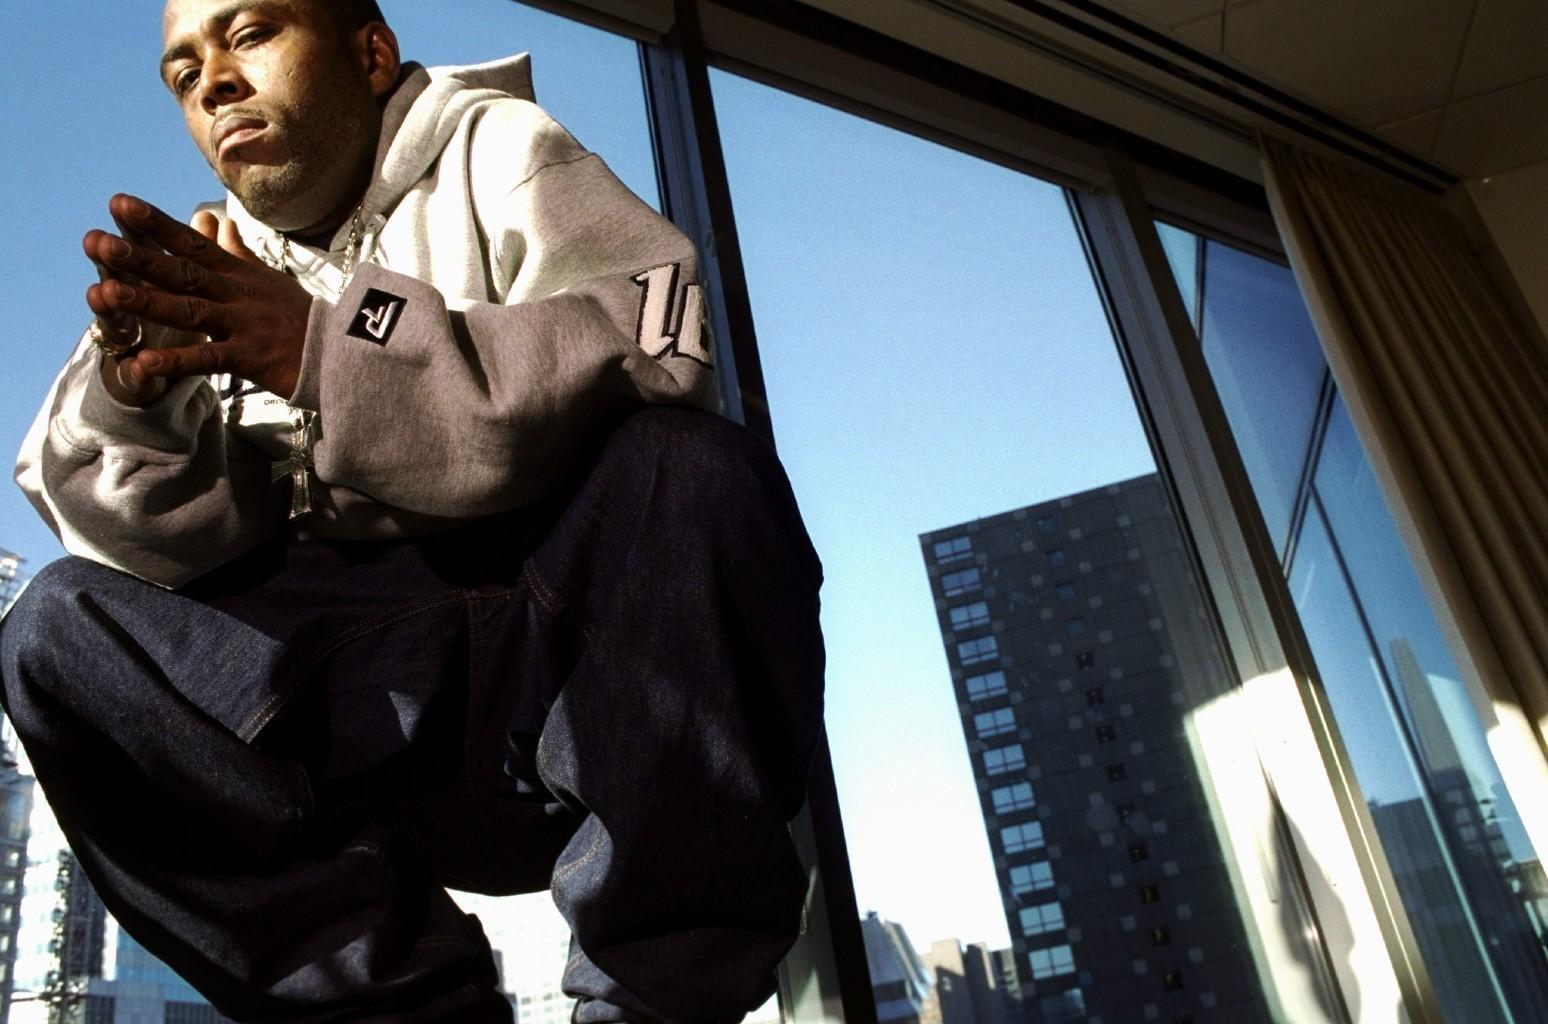 Black Rob, Former Bad Boy Rapper, Dies at 51